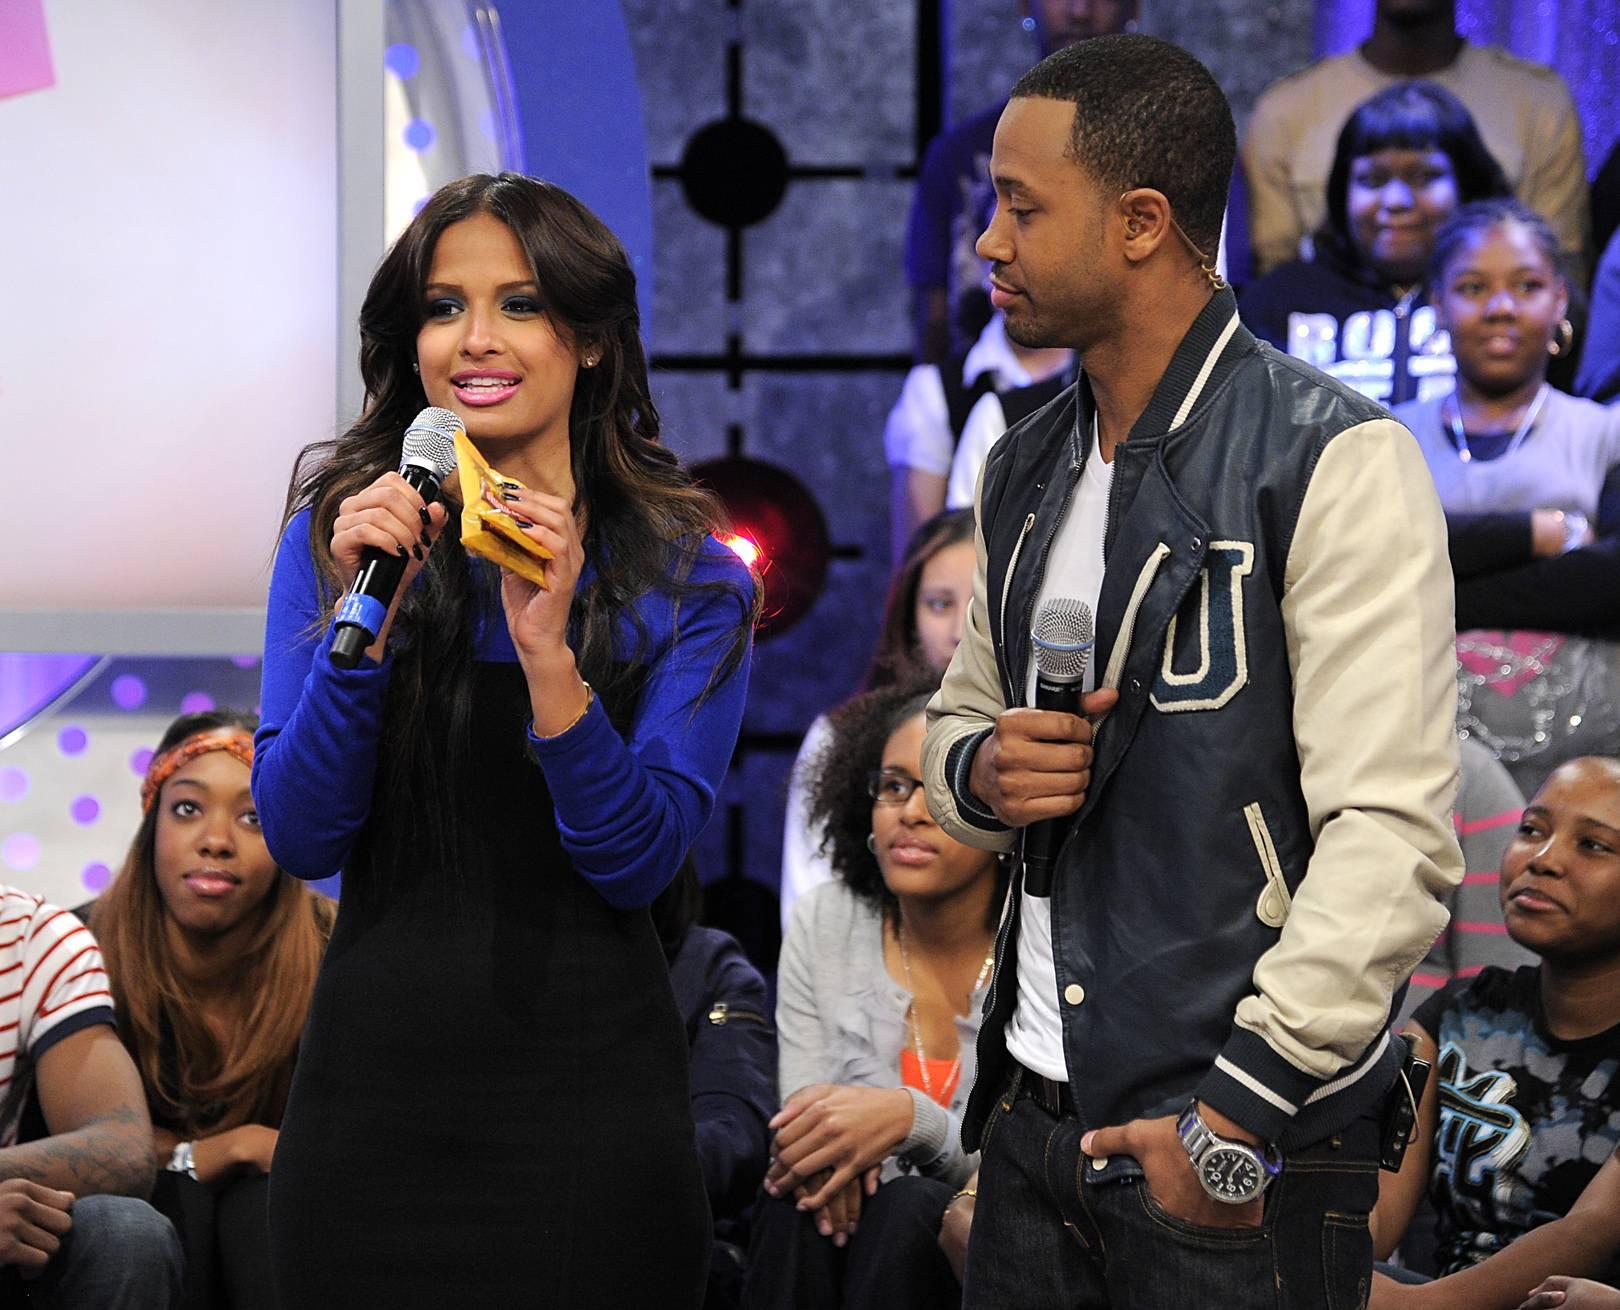 So Good - Rocsi Diaz explains her love of pralines to Terrence J at 106 & Park, January 05, 2012.(Photo: John Ricard/BET)